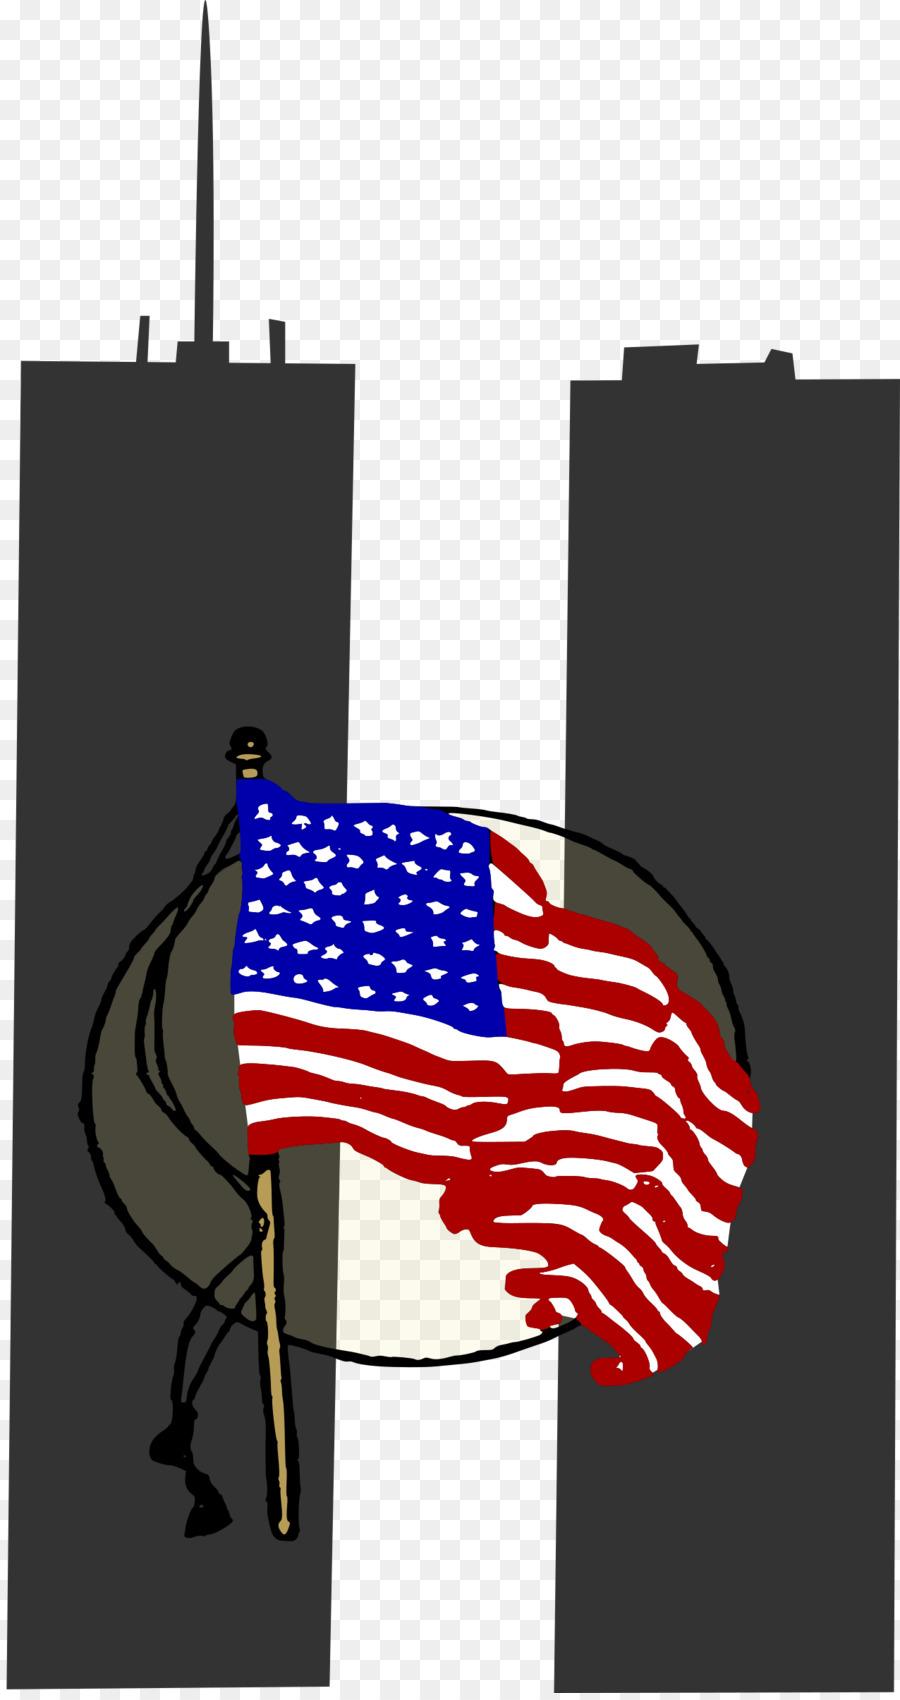 Patriot Day.